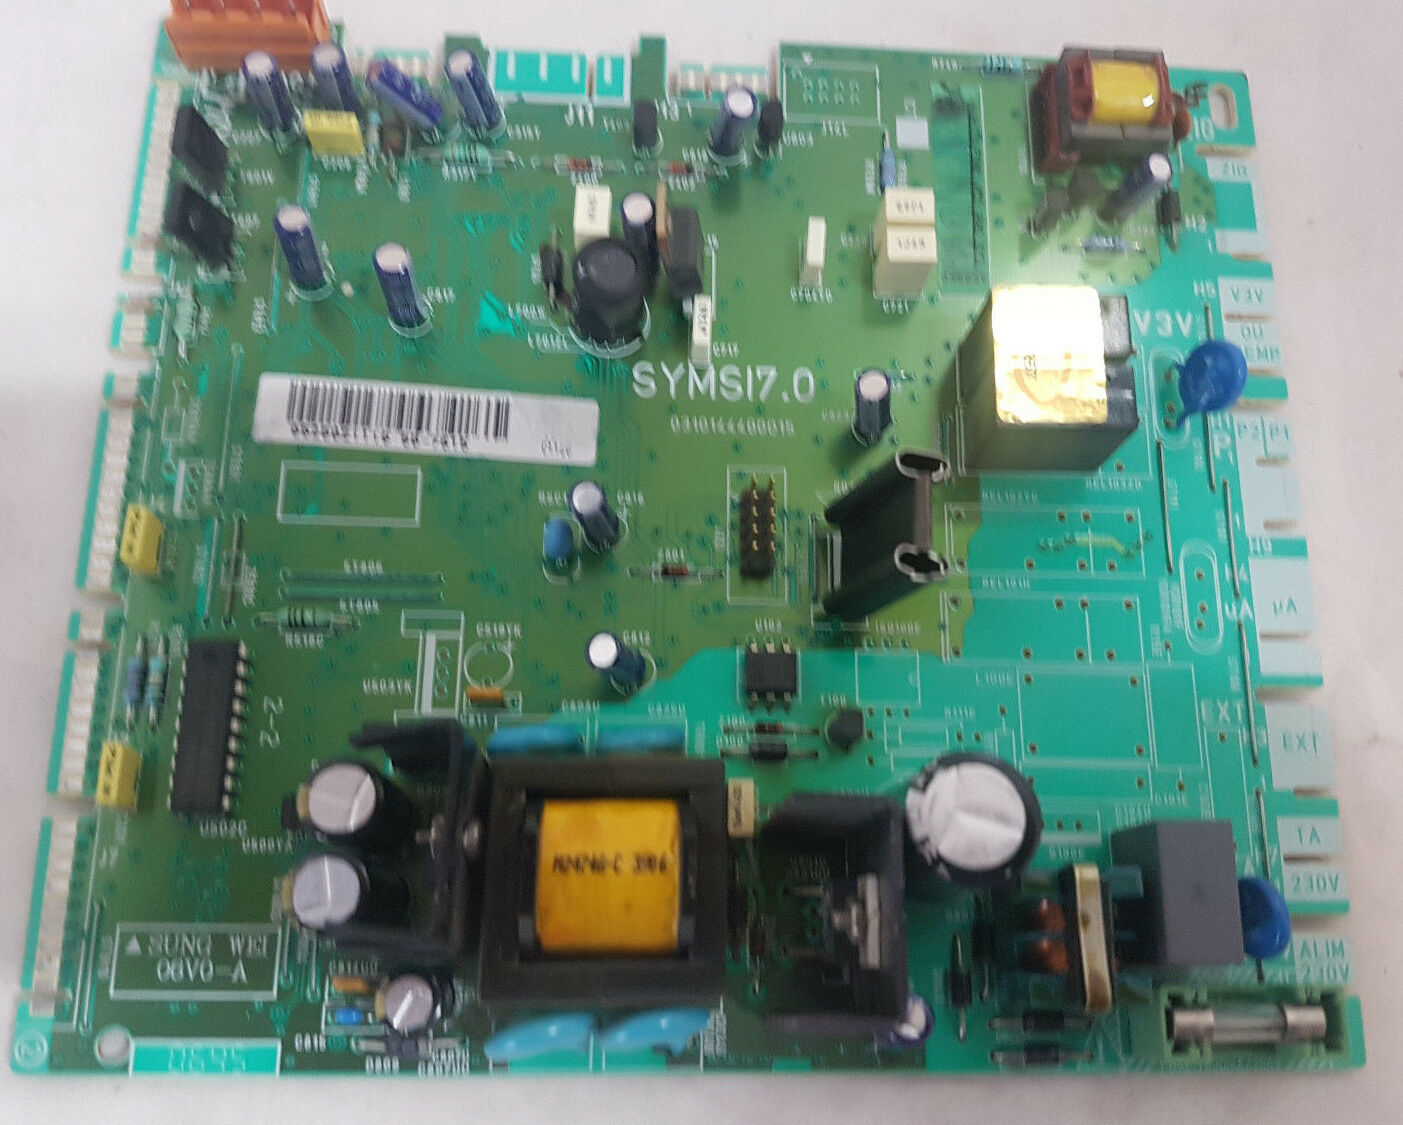 Glow-Worm XI Range PCB Replacement Kit 2000802731 Hsau2238 | eBay